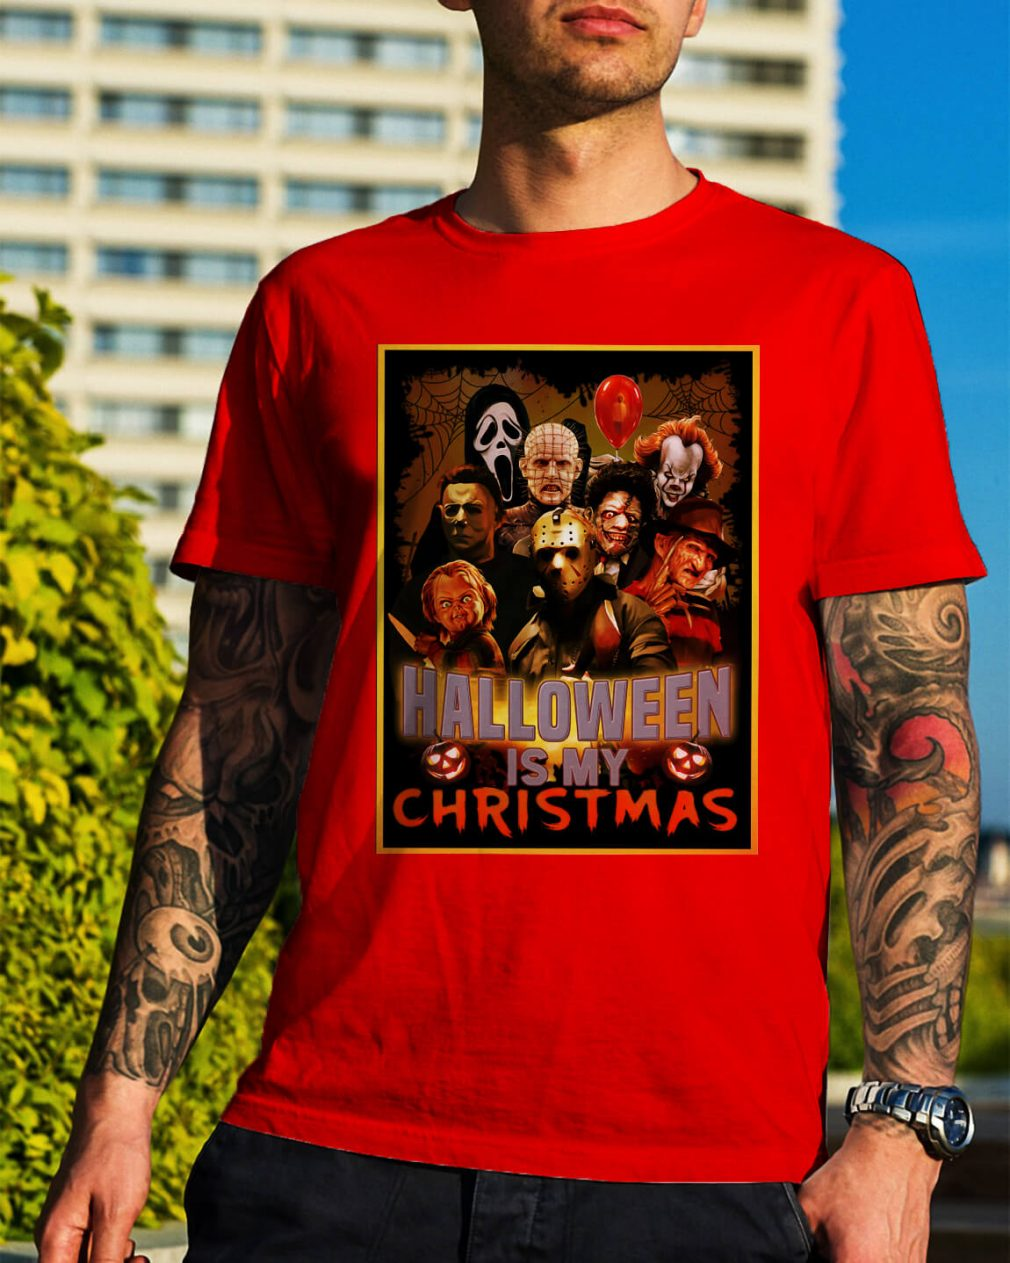 Halloween is my Christmas Honor character shirt